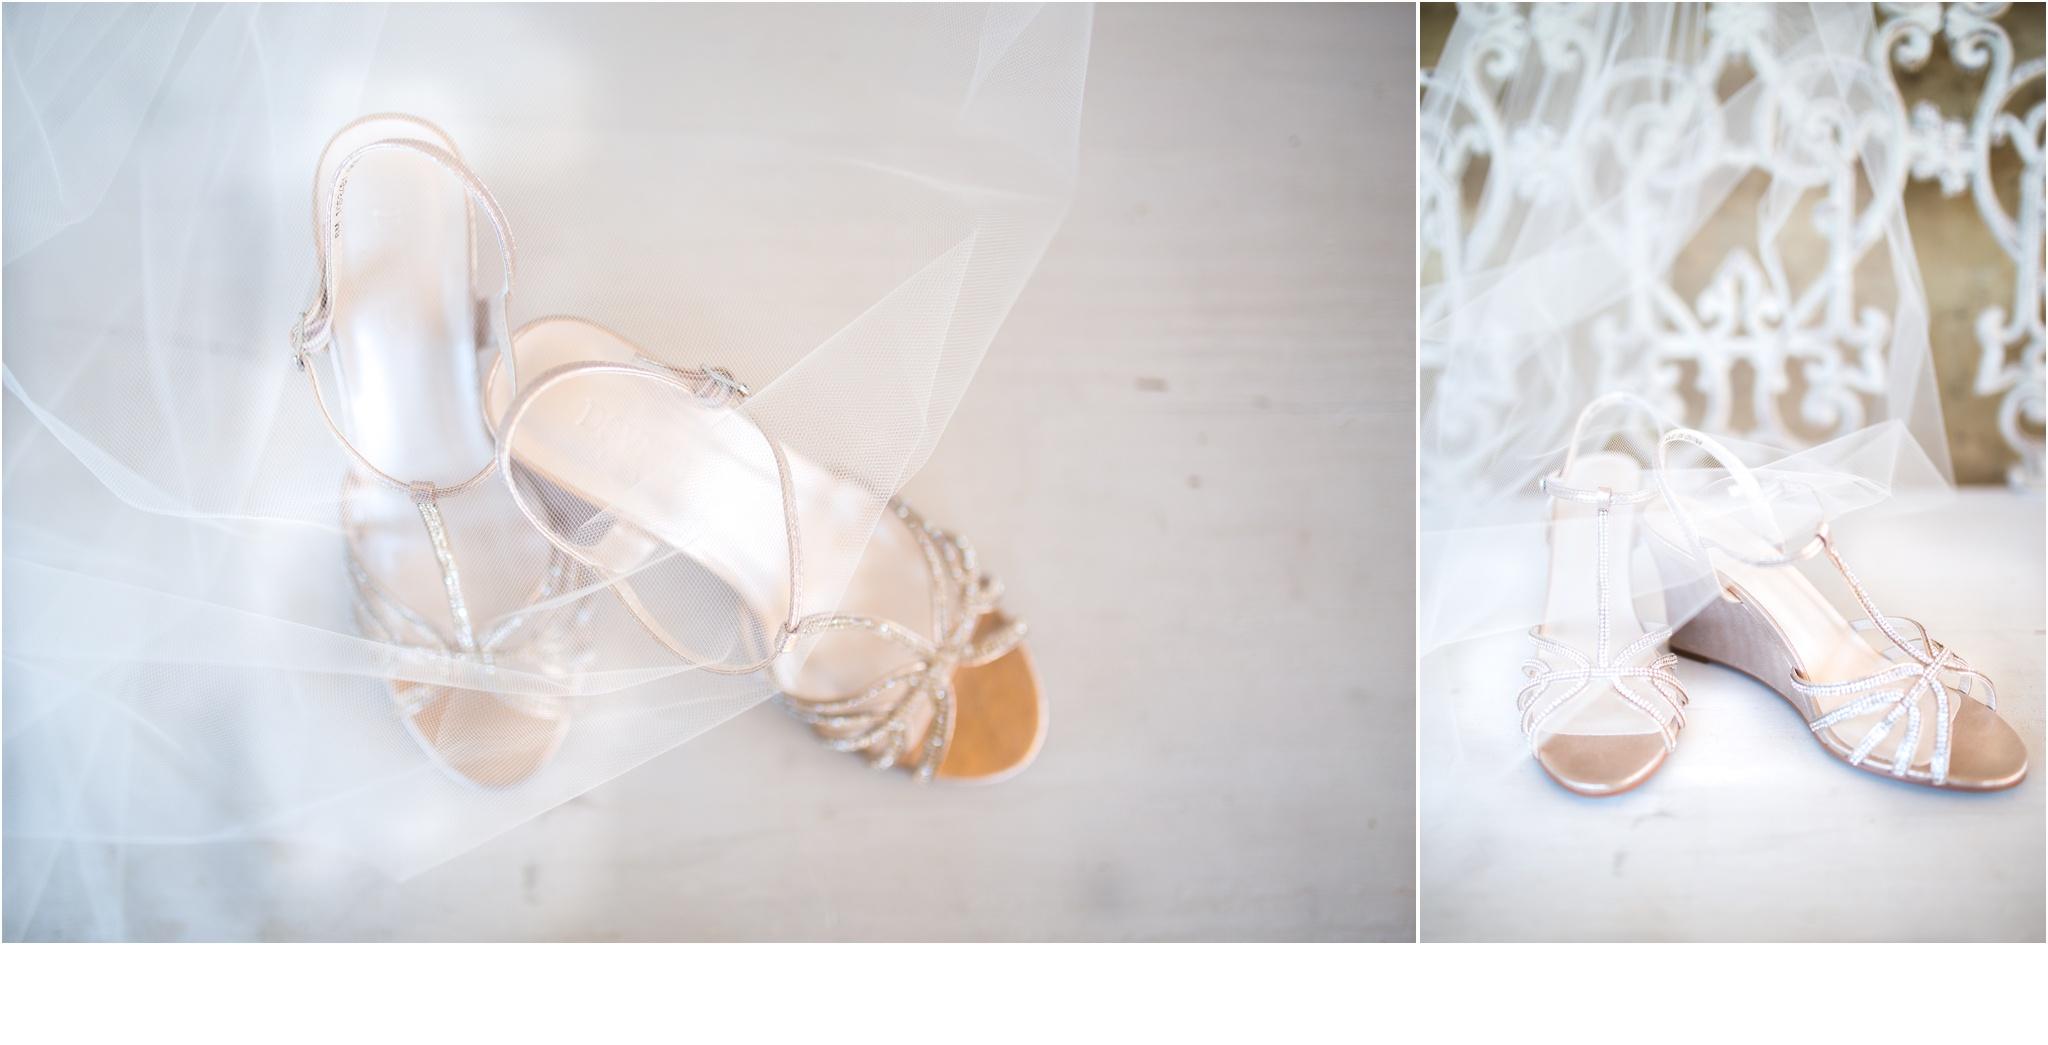 Rainey_Gregg_Photography_St._Simons_Island_Georgia_California_Wedding_Portrait_Photography_0632.jpg